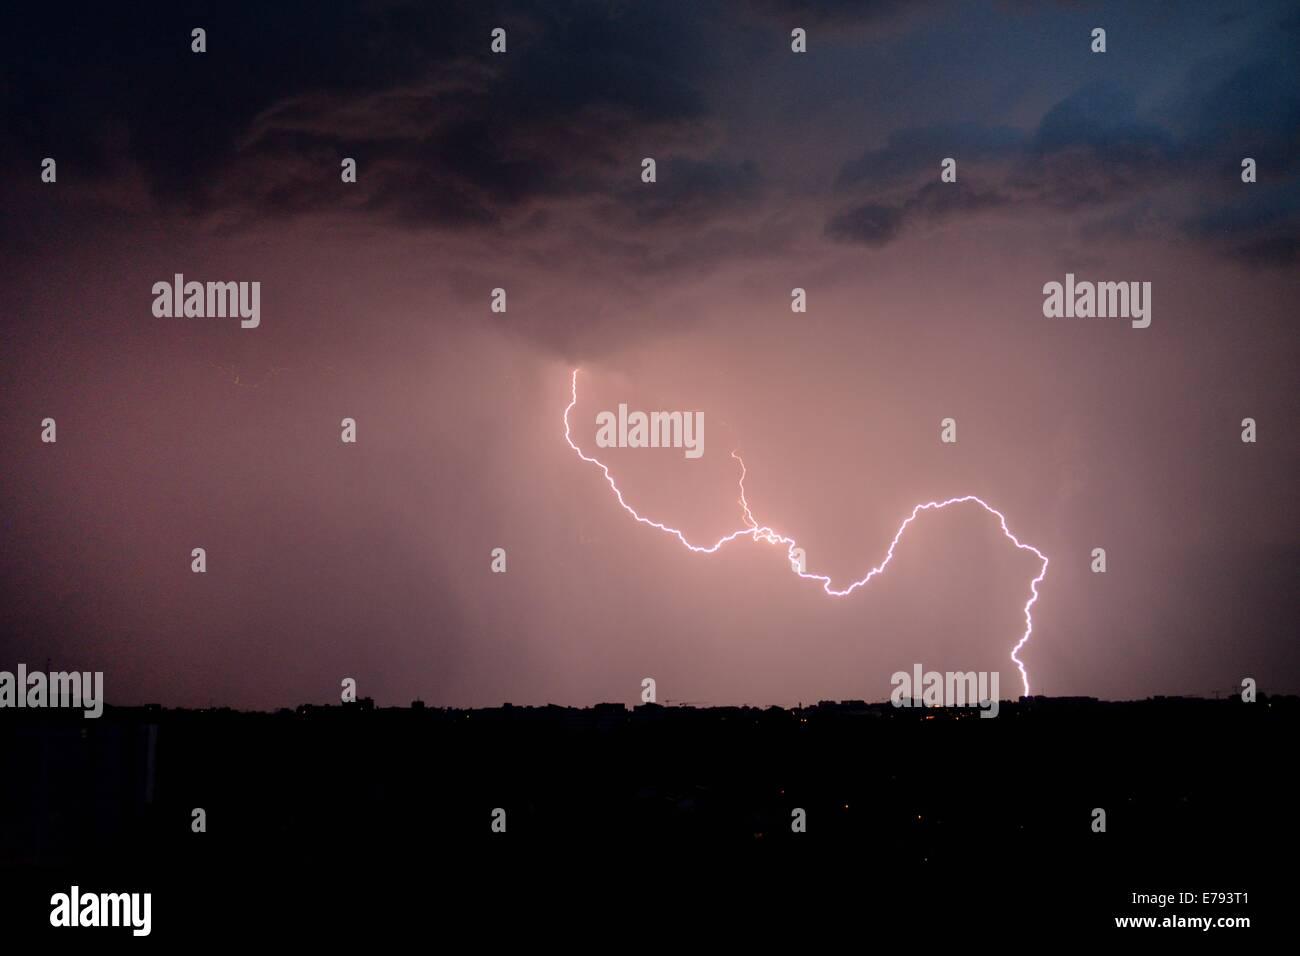 lightning bolt in night sky over the horizon Stock Photo